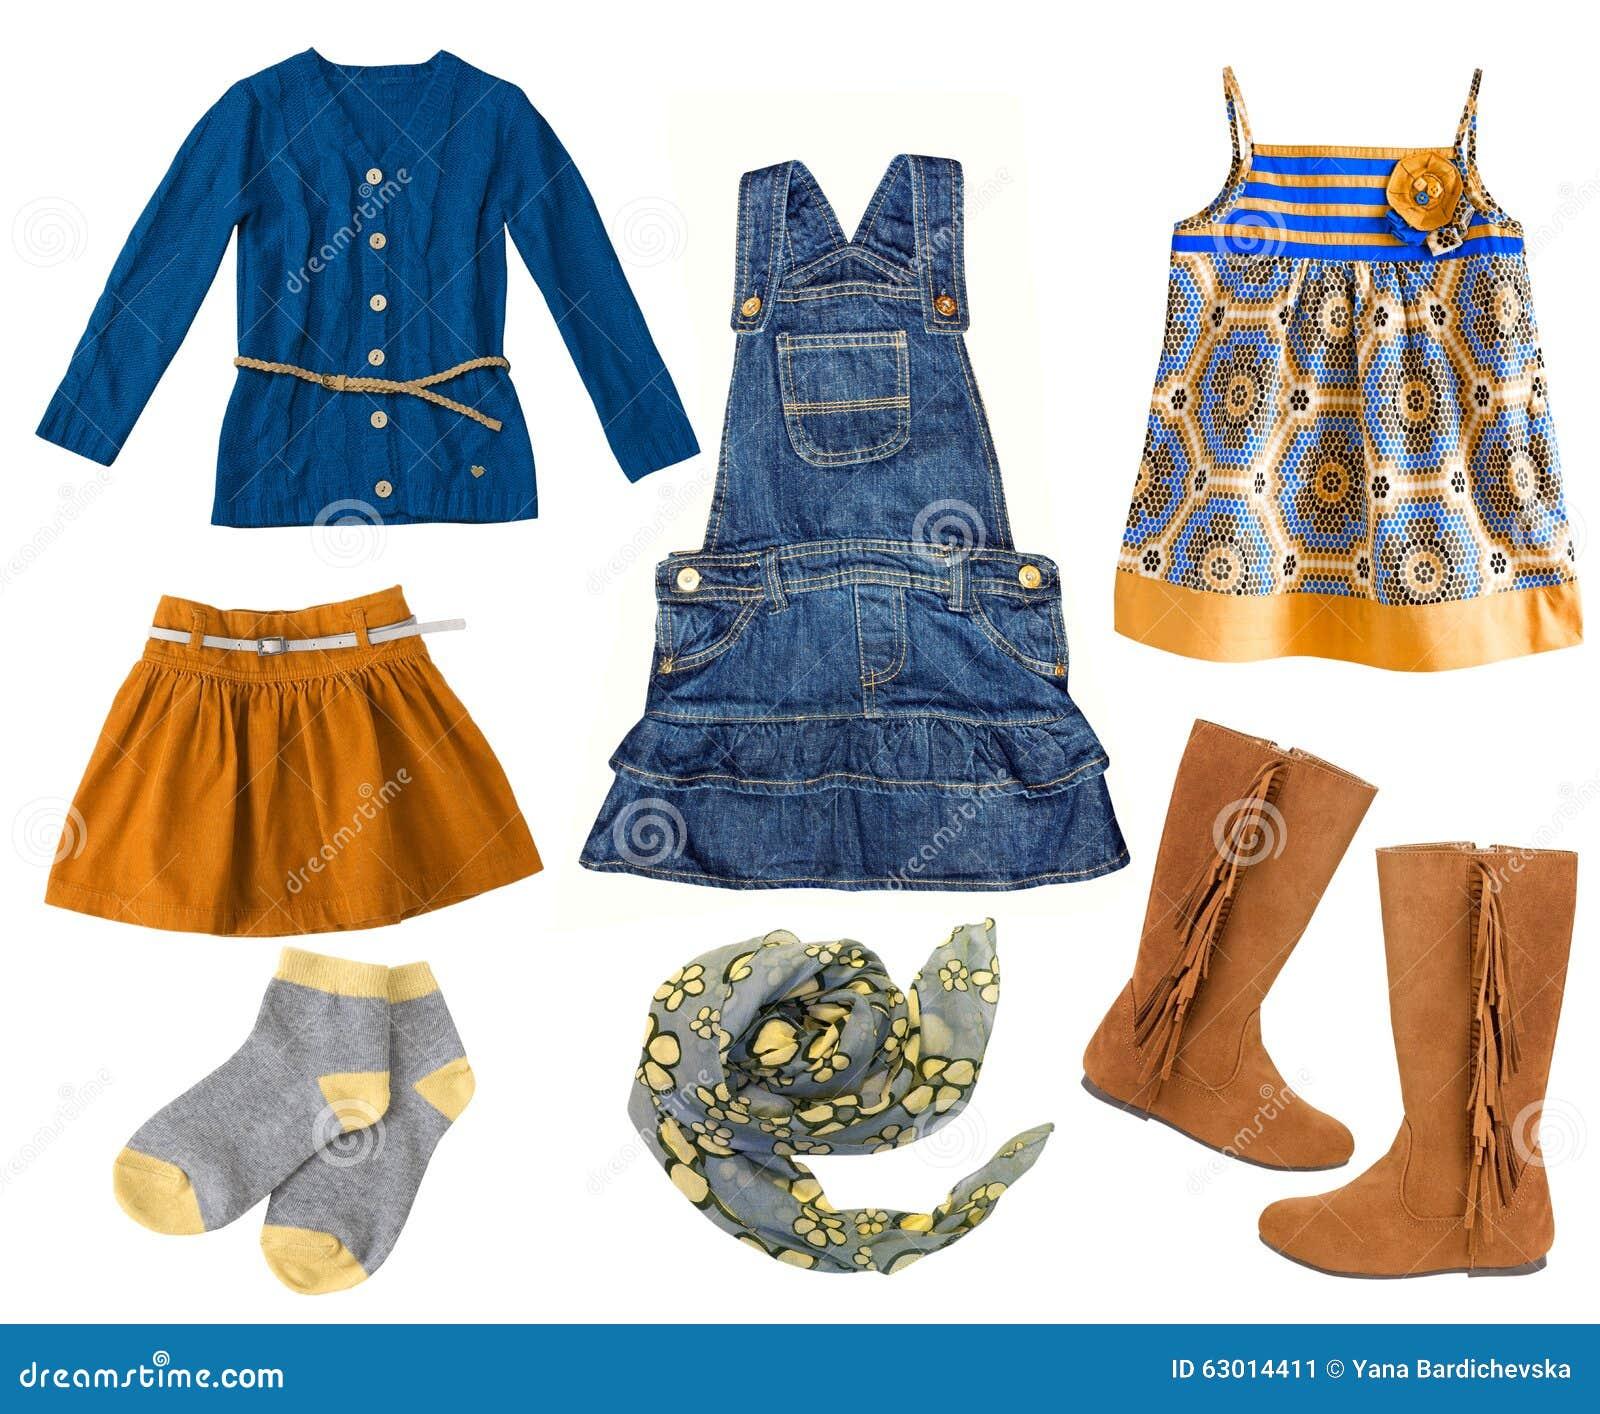 Fashion kid 39 s clothing set collage of child girl 39 s clothes stock image image 63014411 Mla winter style fashion set